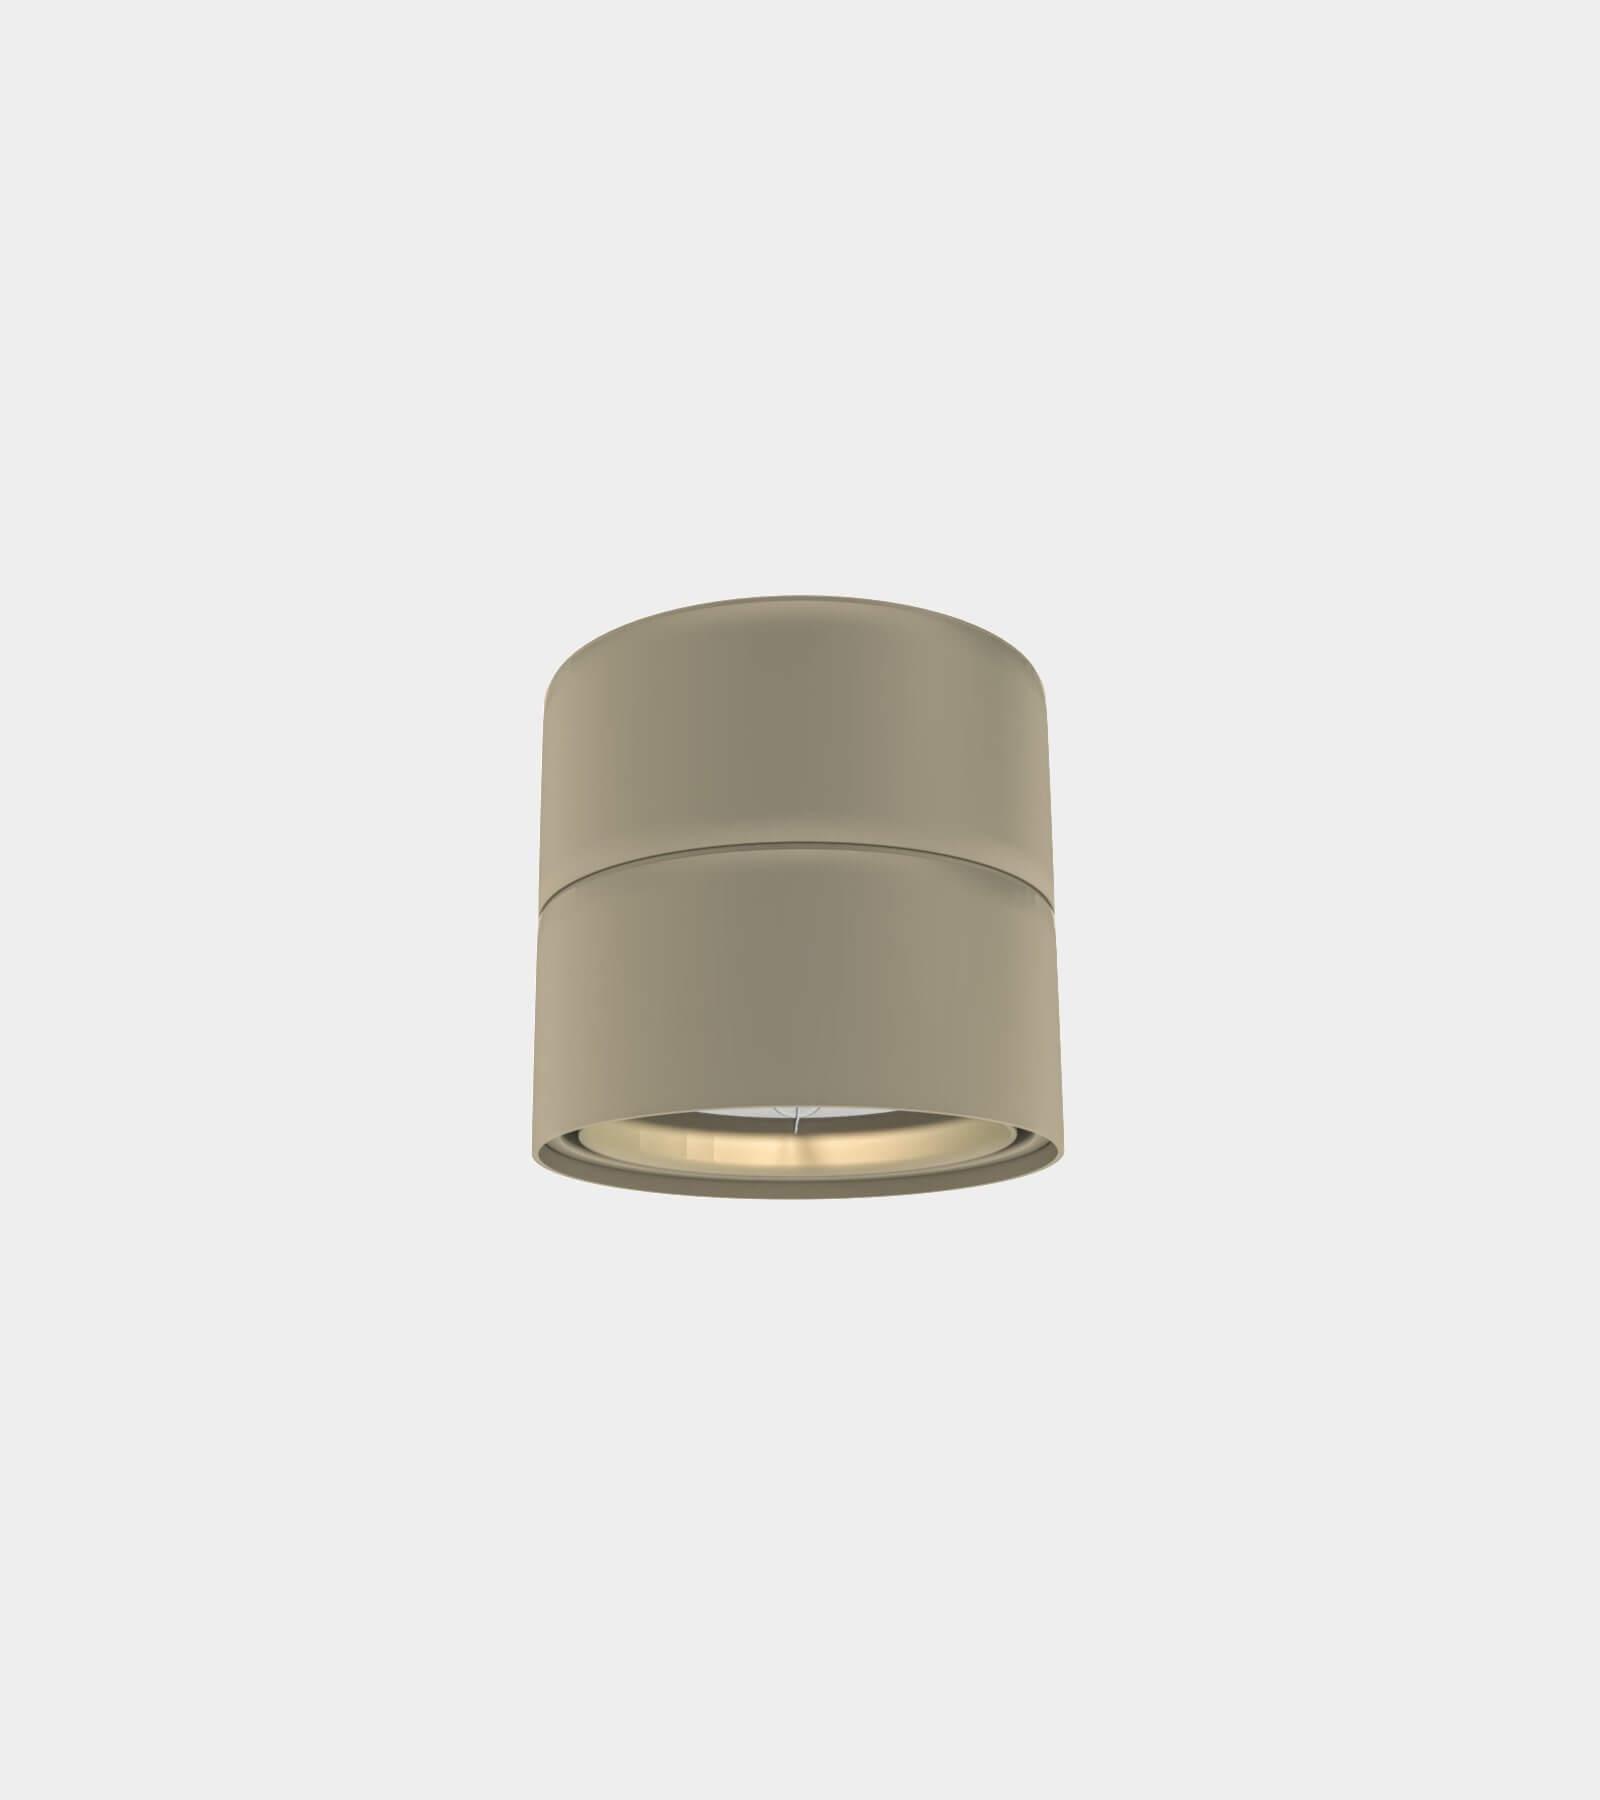 Adjustable ceiling spot light 2 - 3D Model